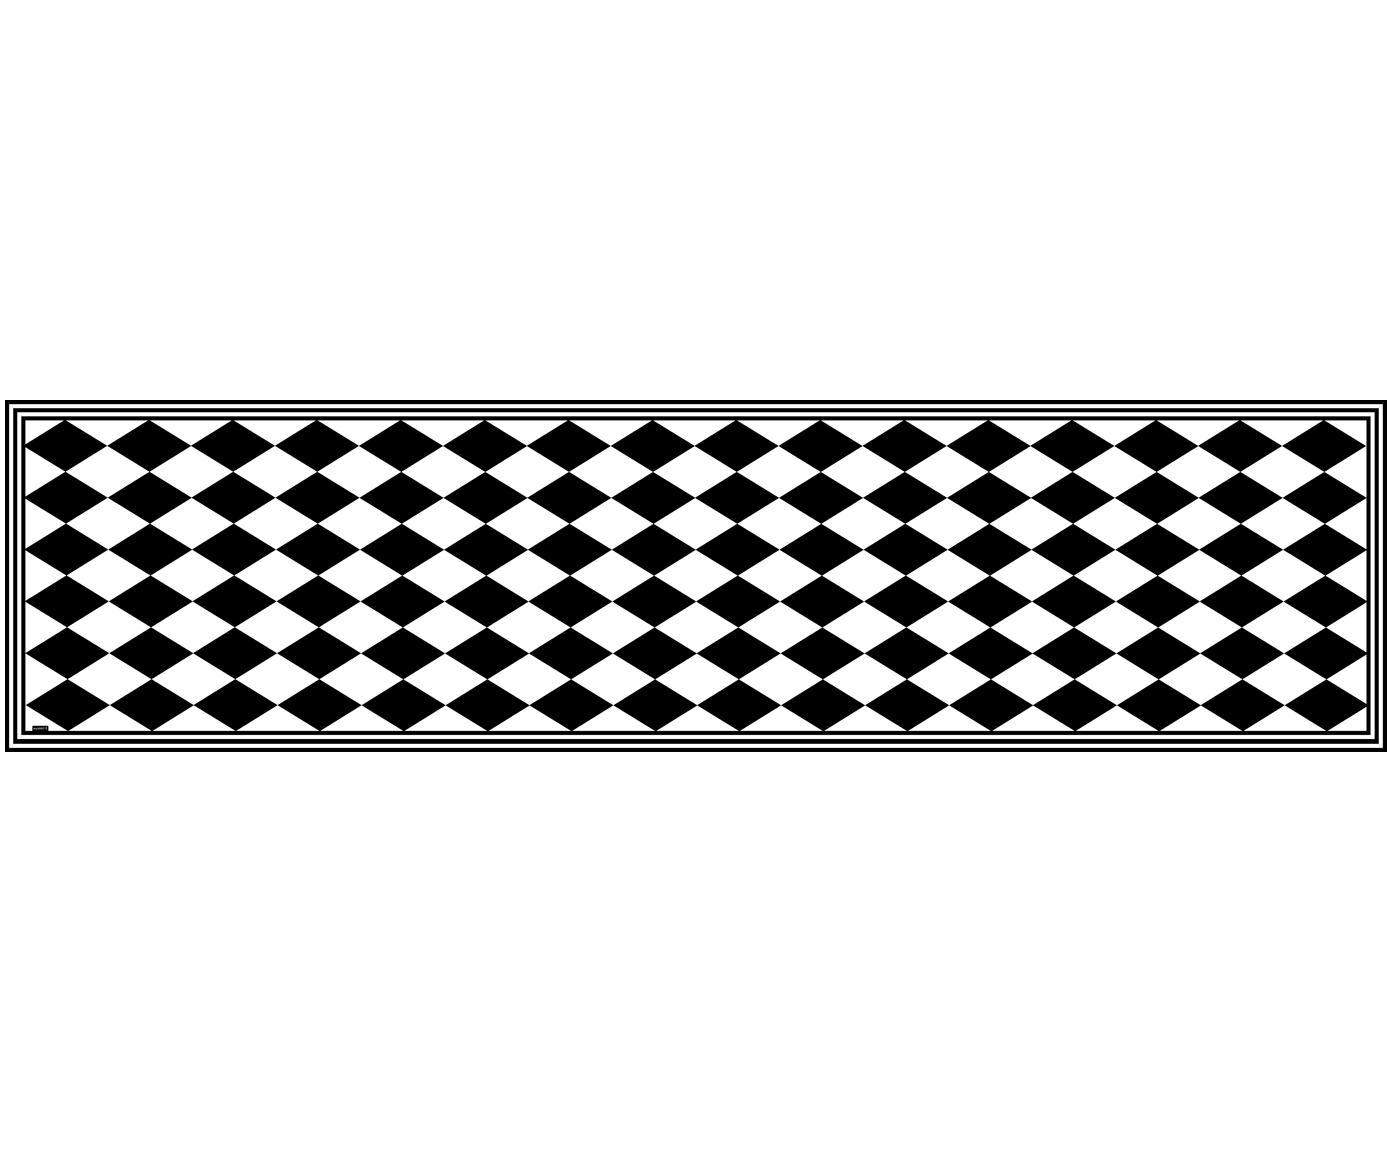 Vinyl vloermat Bobby II, Recyclebaar vinyl, Zwart, wit, 65 x 255 cm